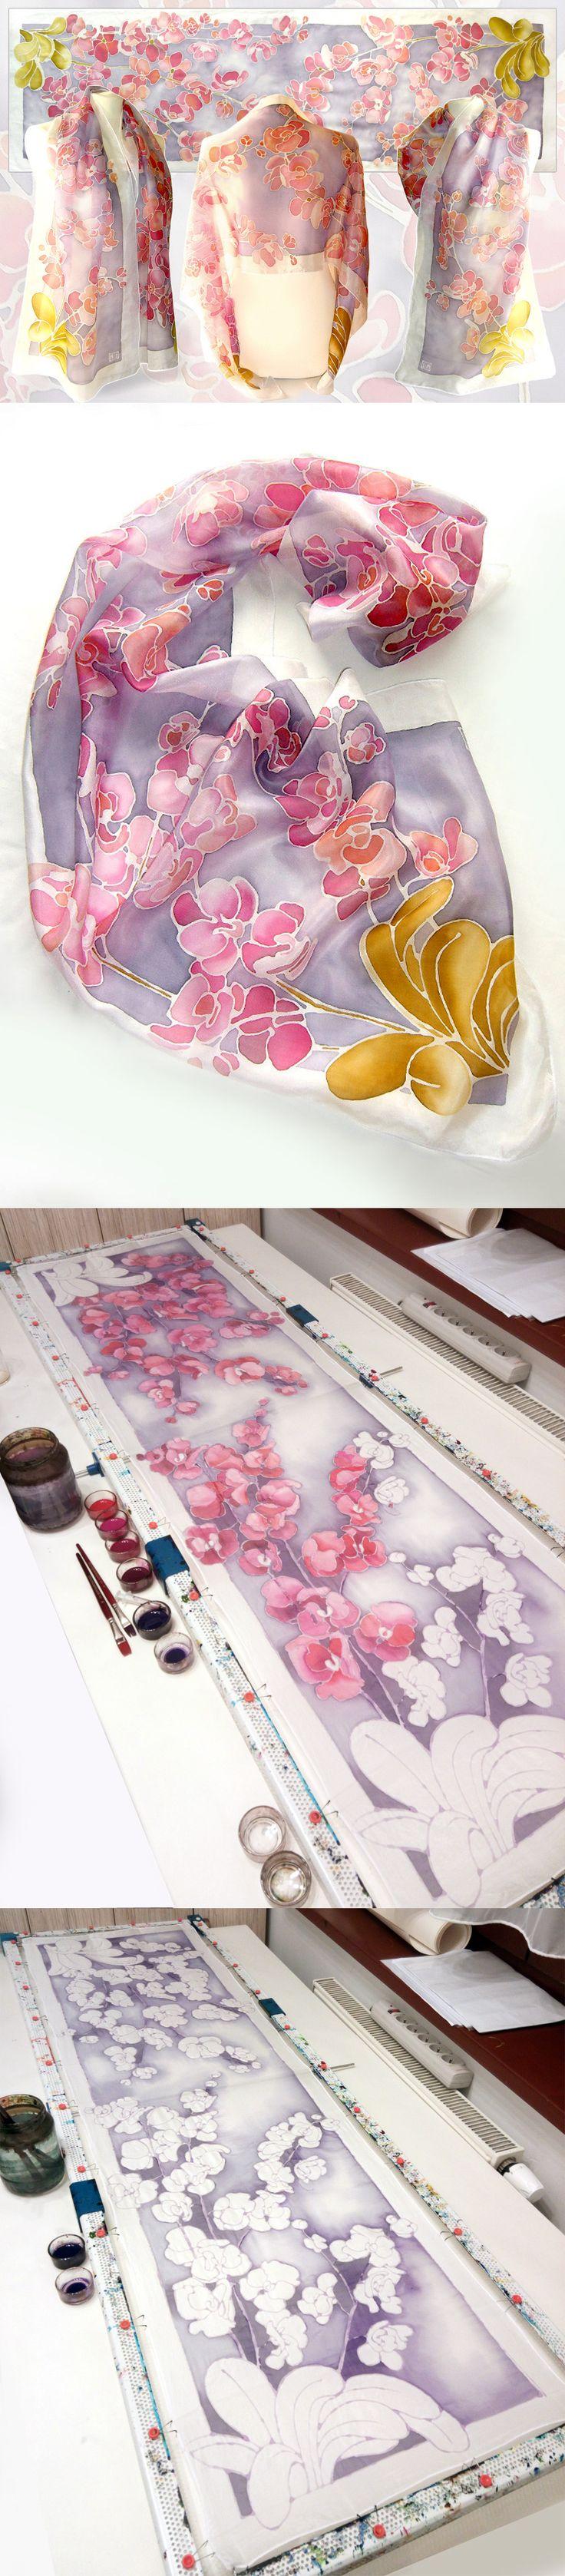 #silk #scarf #handpainted by #Malinowska Luiza #minkulul #orchid #floral #scarves